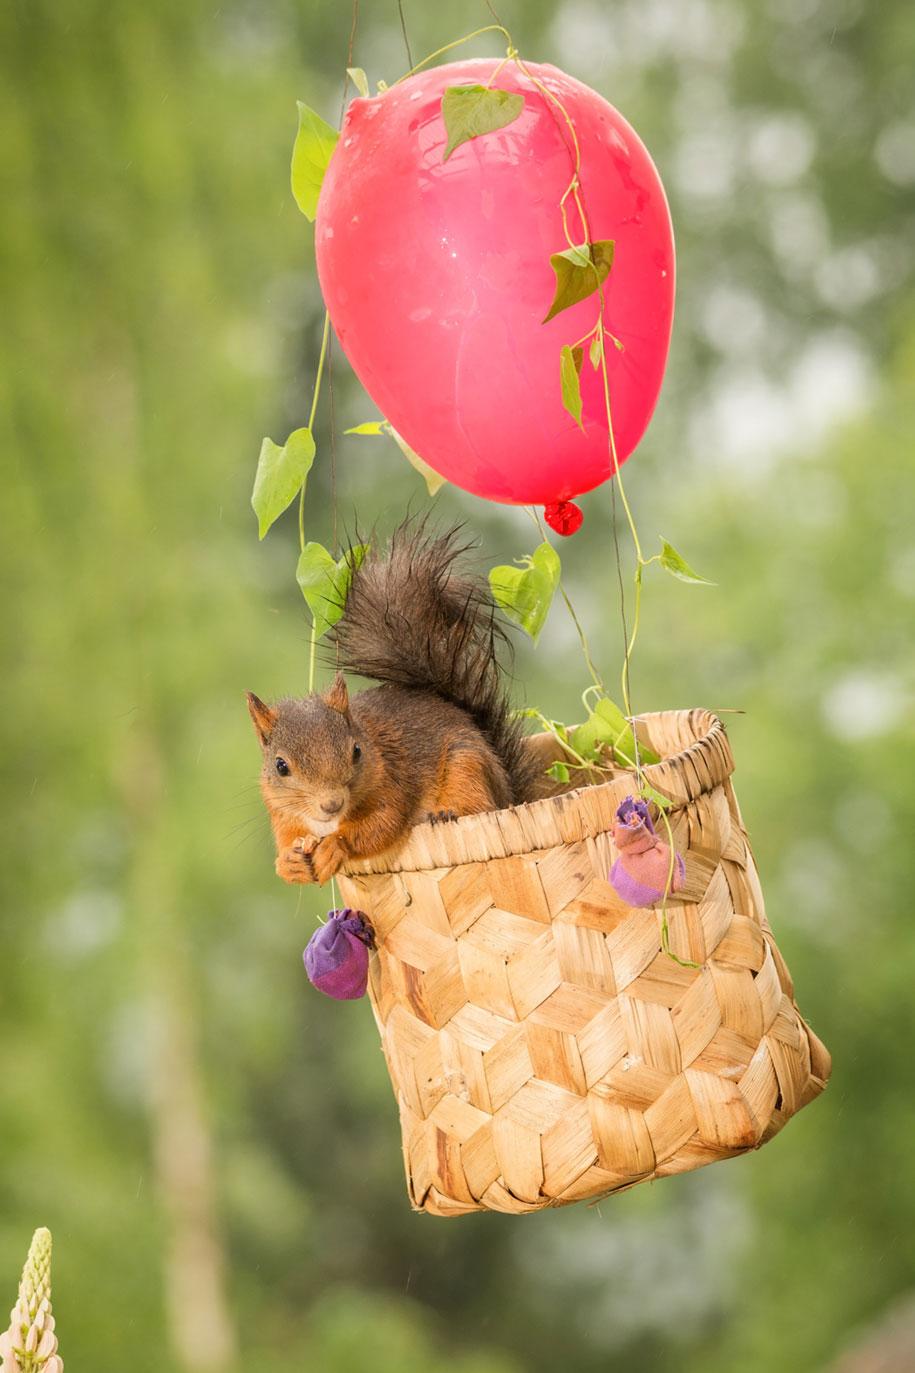 nature-animal-photography-backyard-squirrels-geert-weggen-17